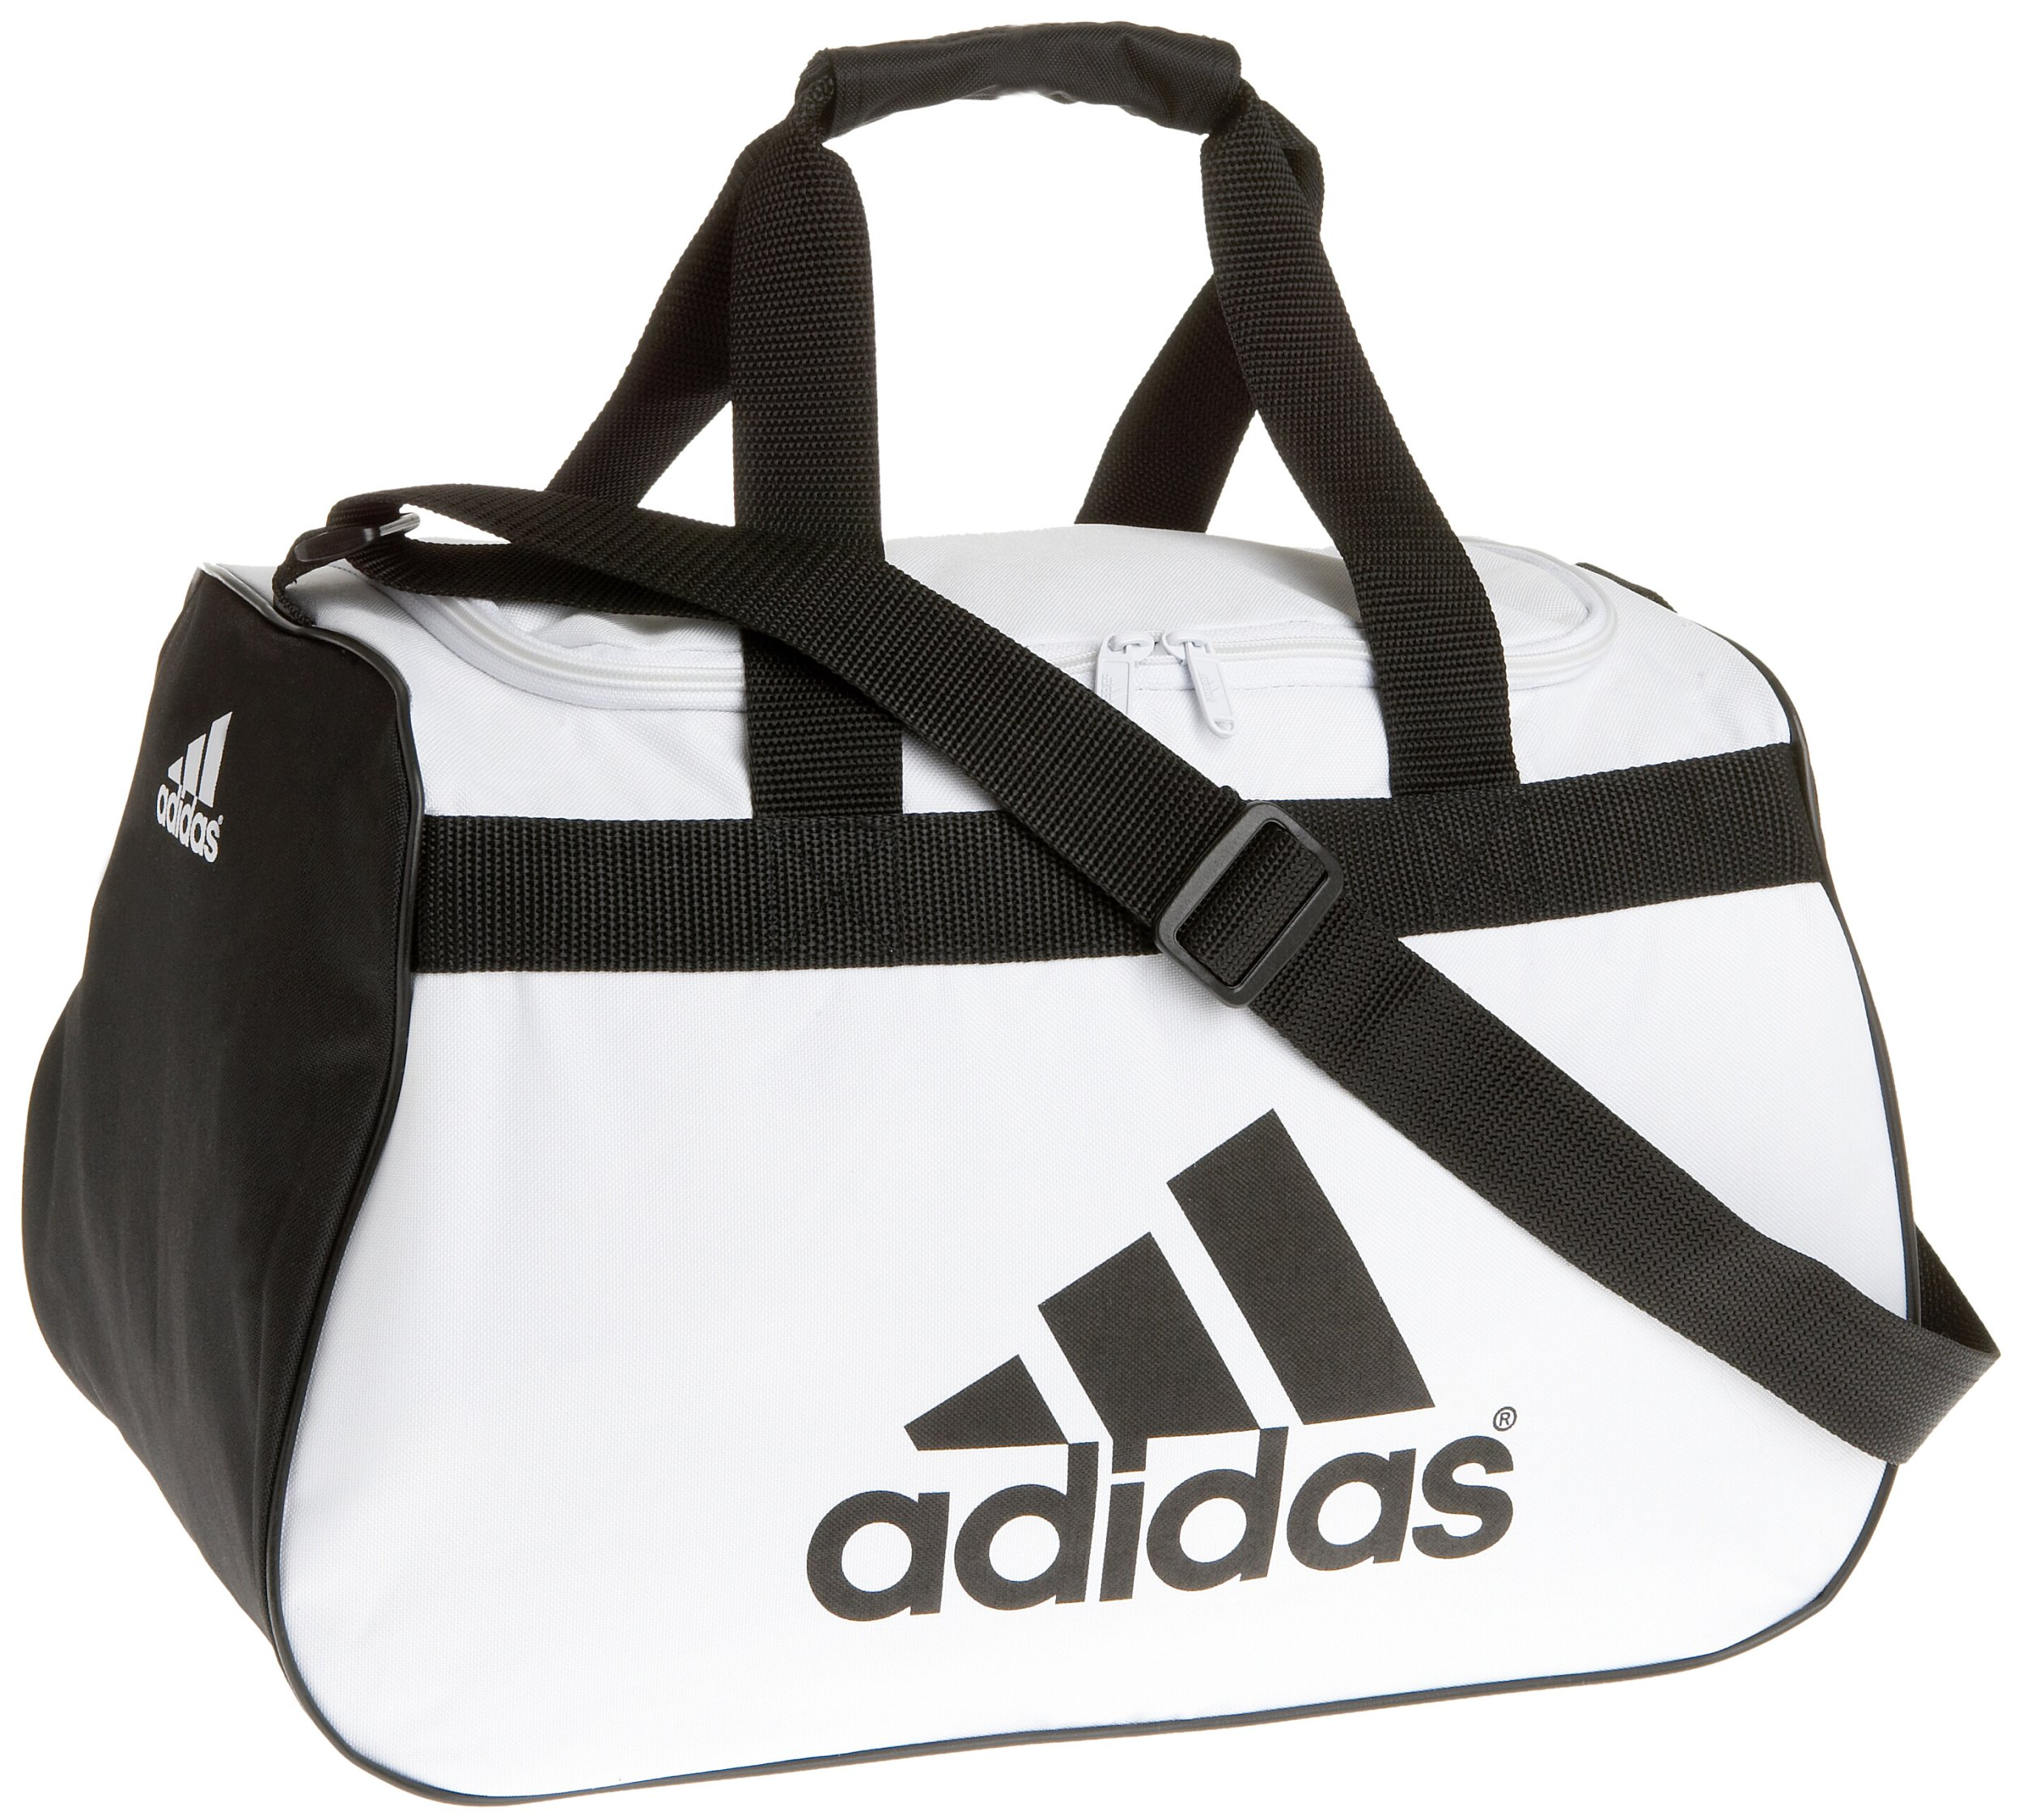 adidas Diablo Small Duffel Bag, White/Black, One Size